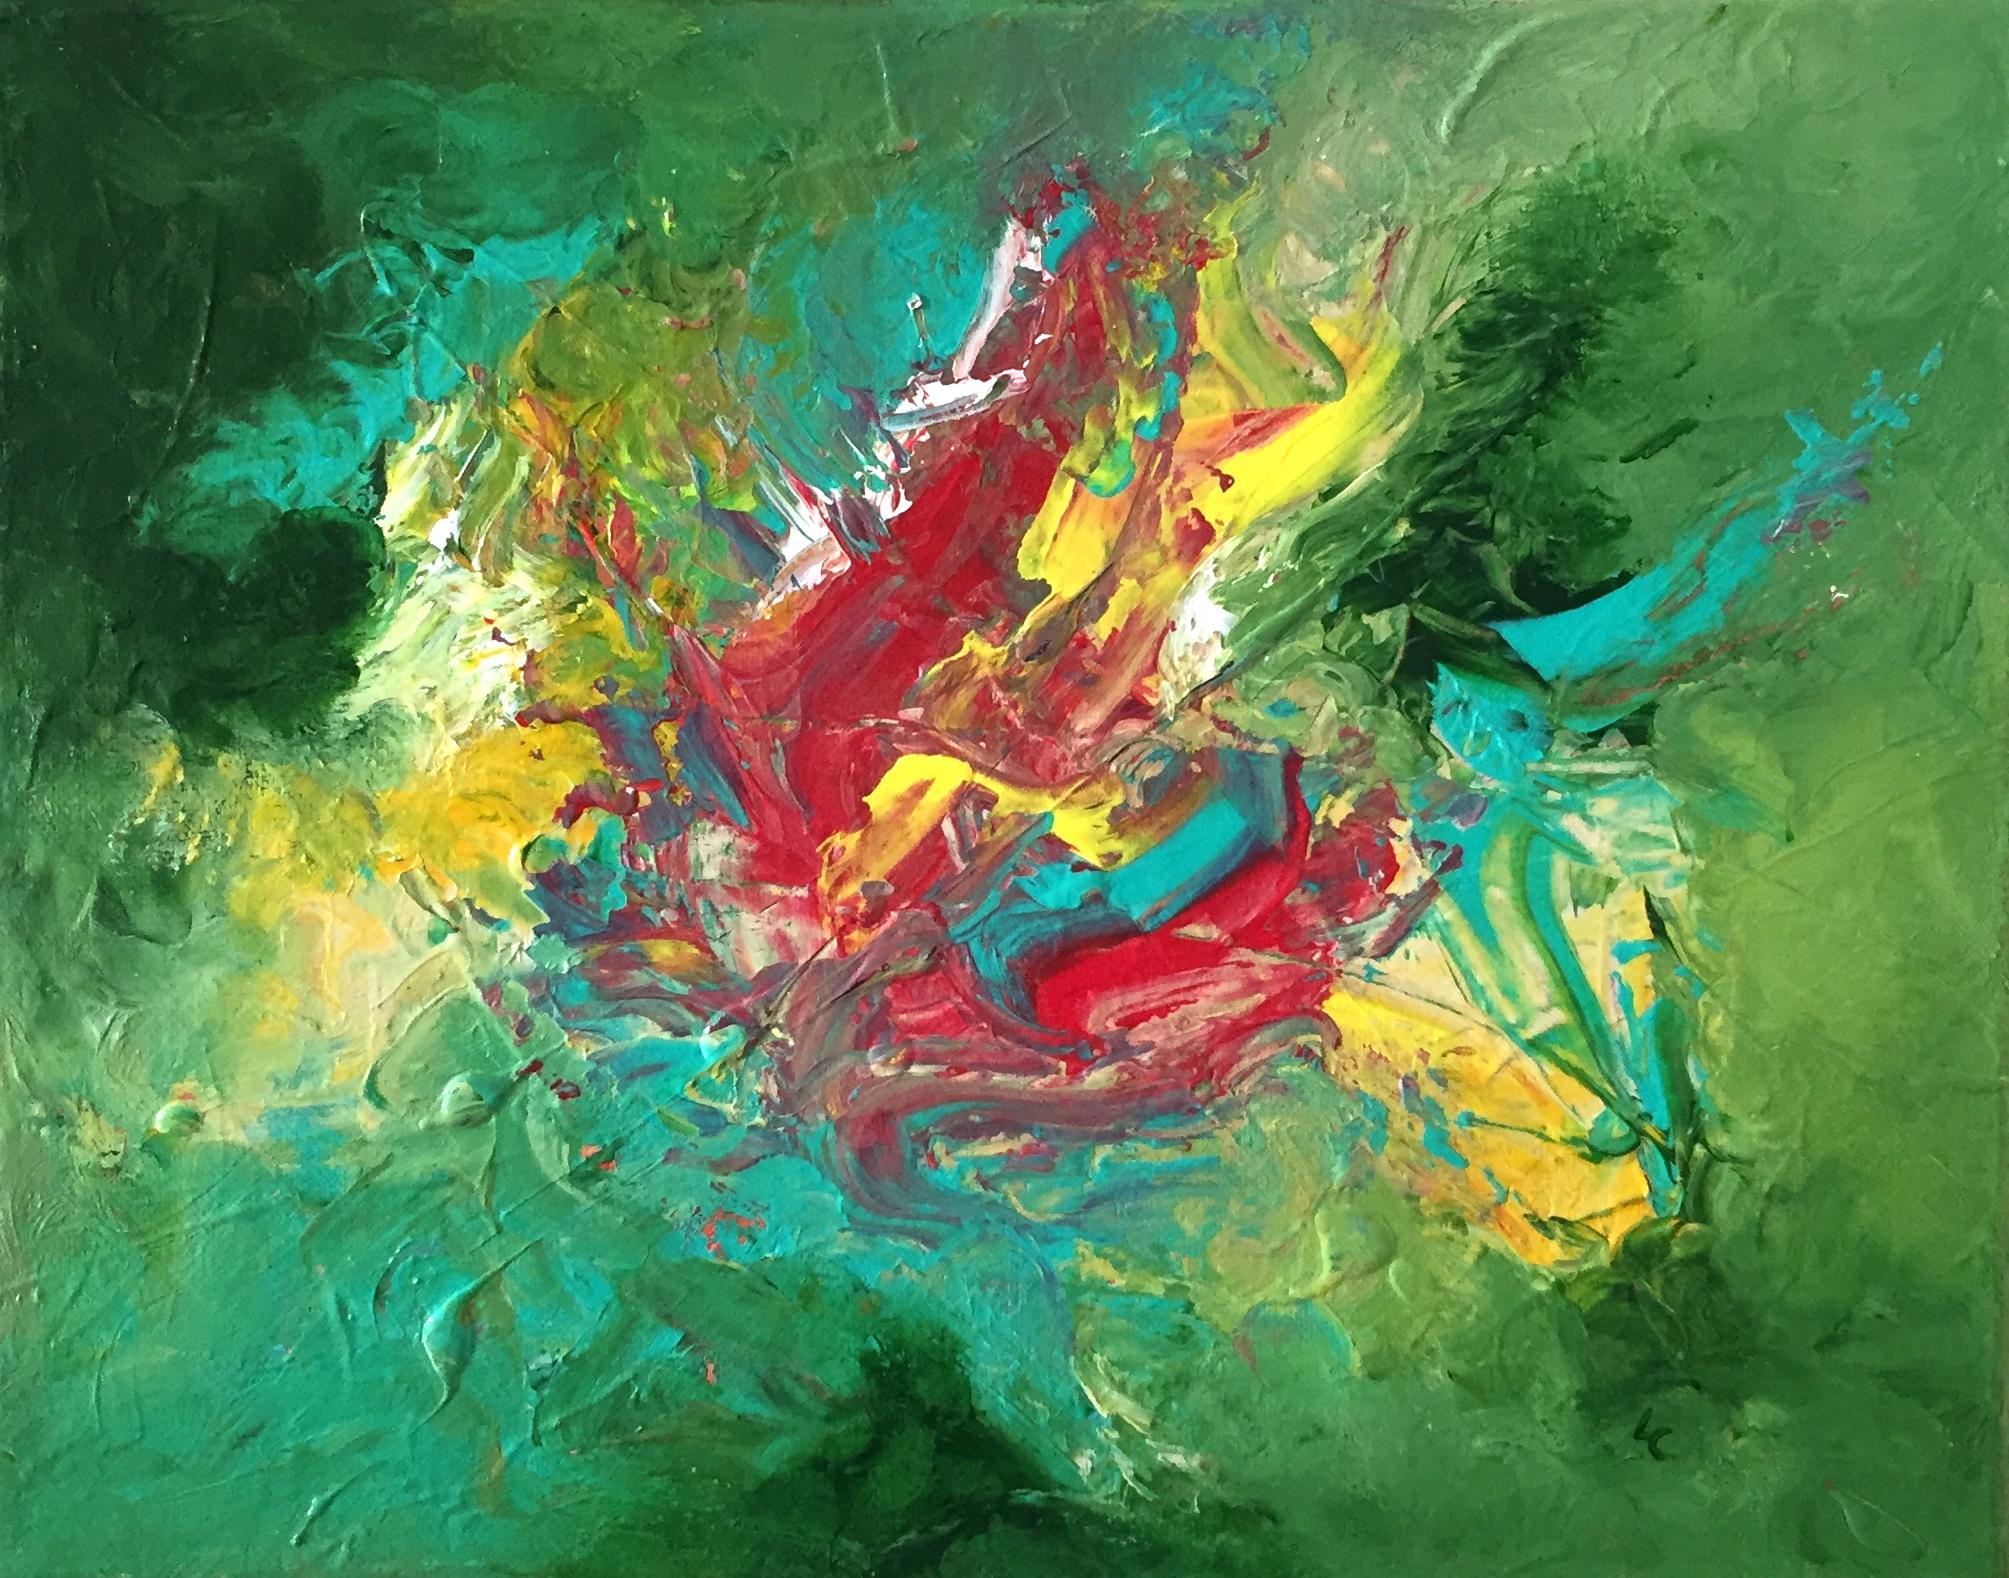 "Rediscovering Atlantis 11"" x 14"" acrylic on canvas"